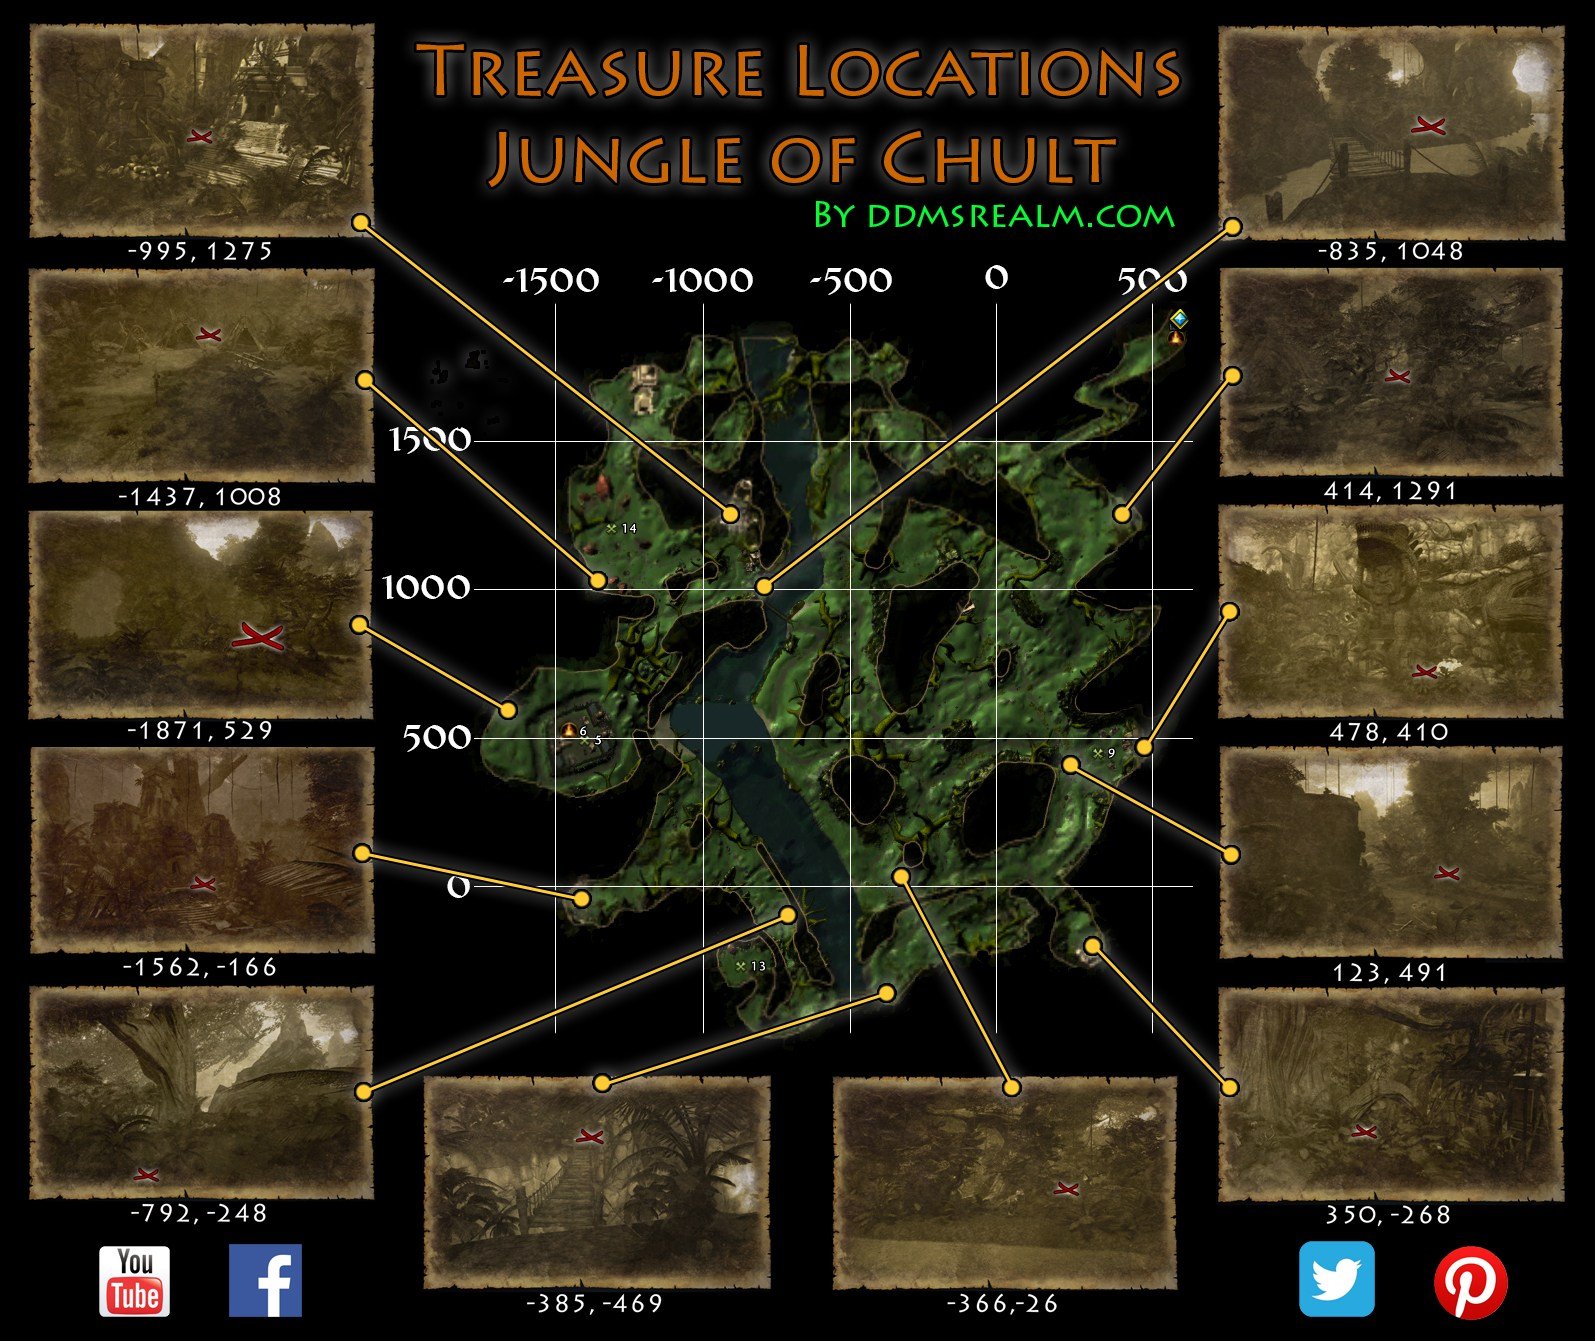 Carte Au Tresor Neverwinter Quartier De La Riviere.Soshenstar Guilde Myths